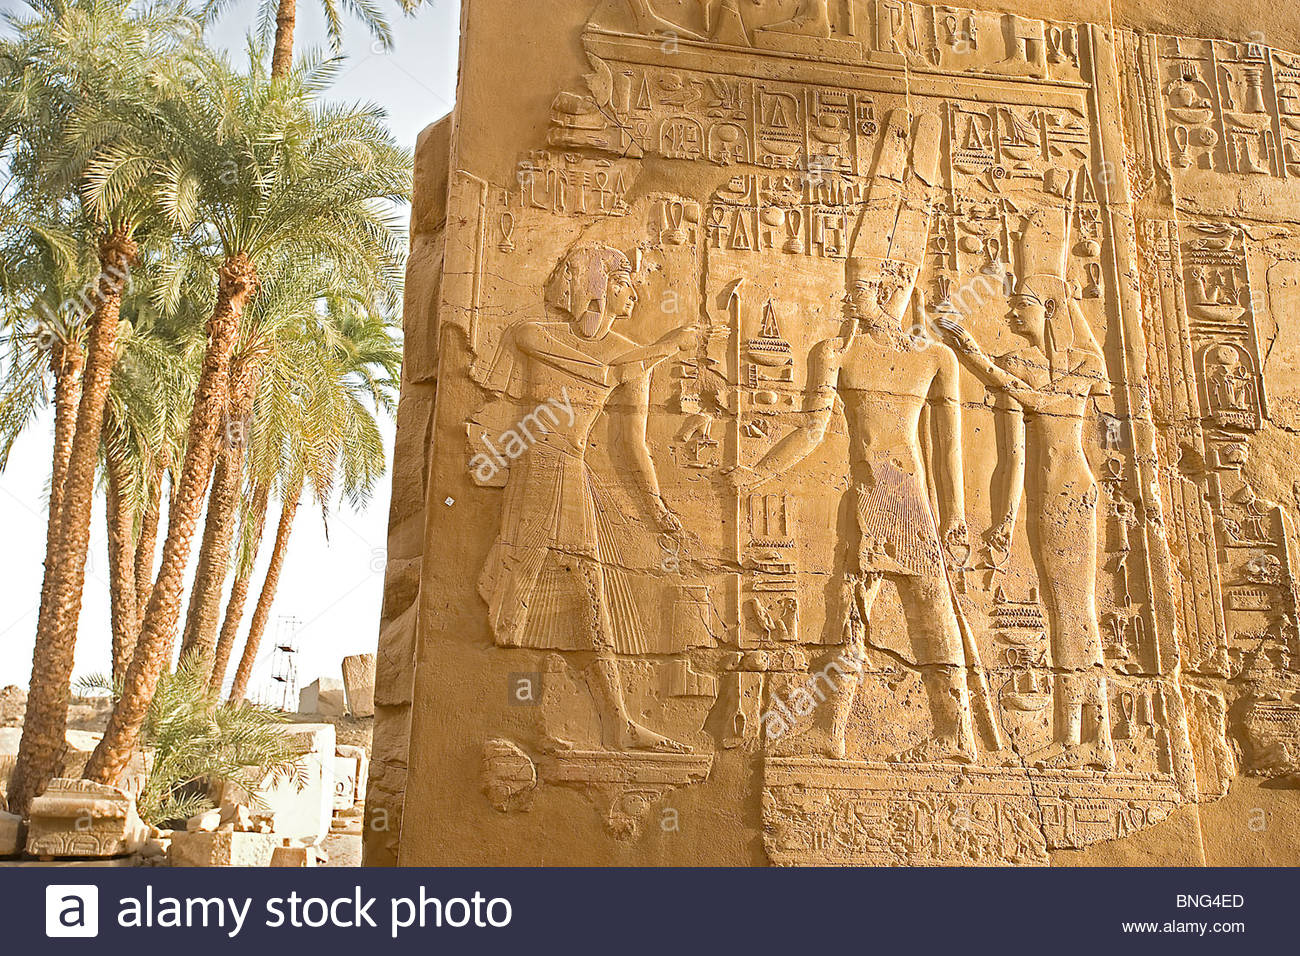 Temple of Amon-Ra,El Karnak,Egypt - Stock Image